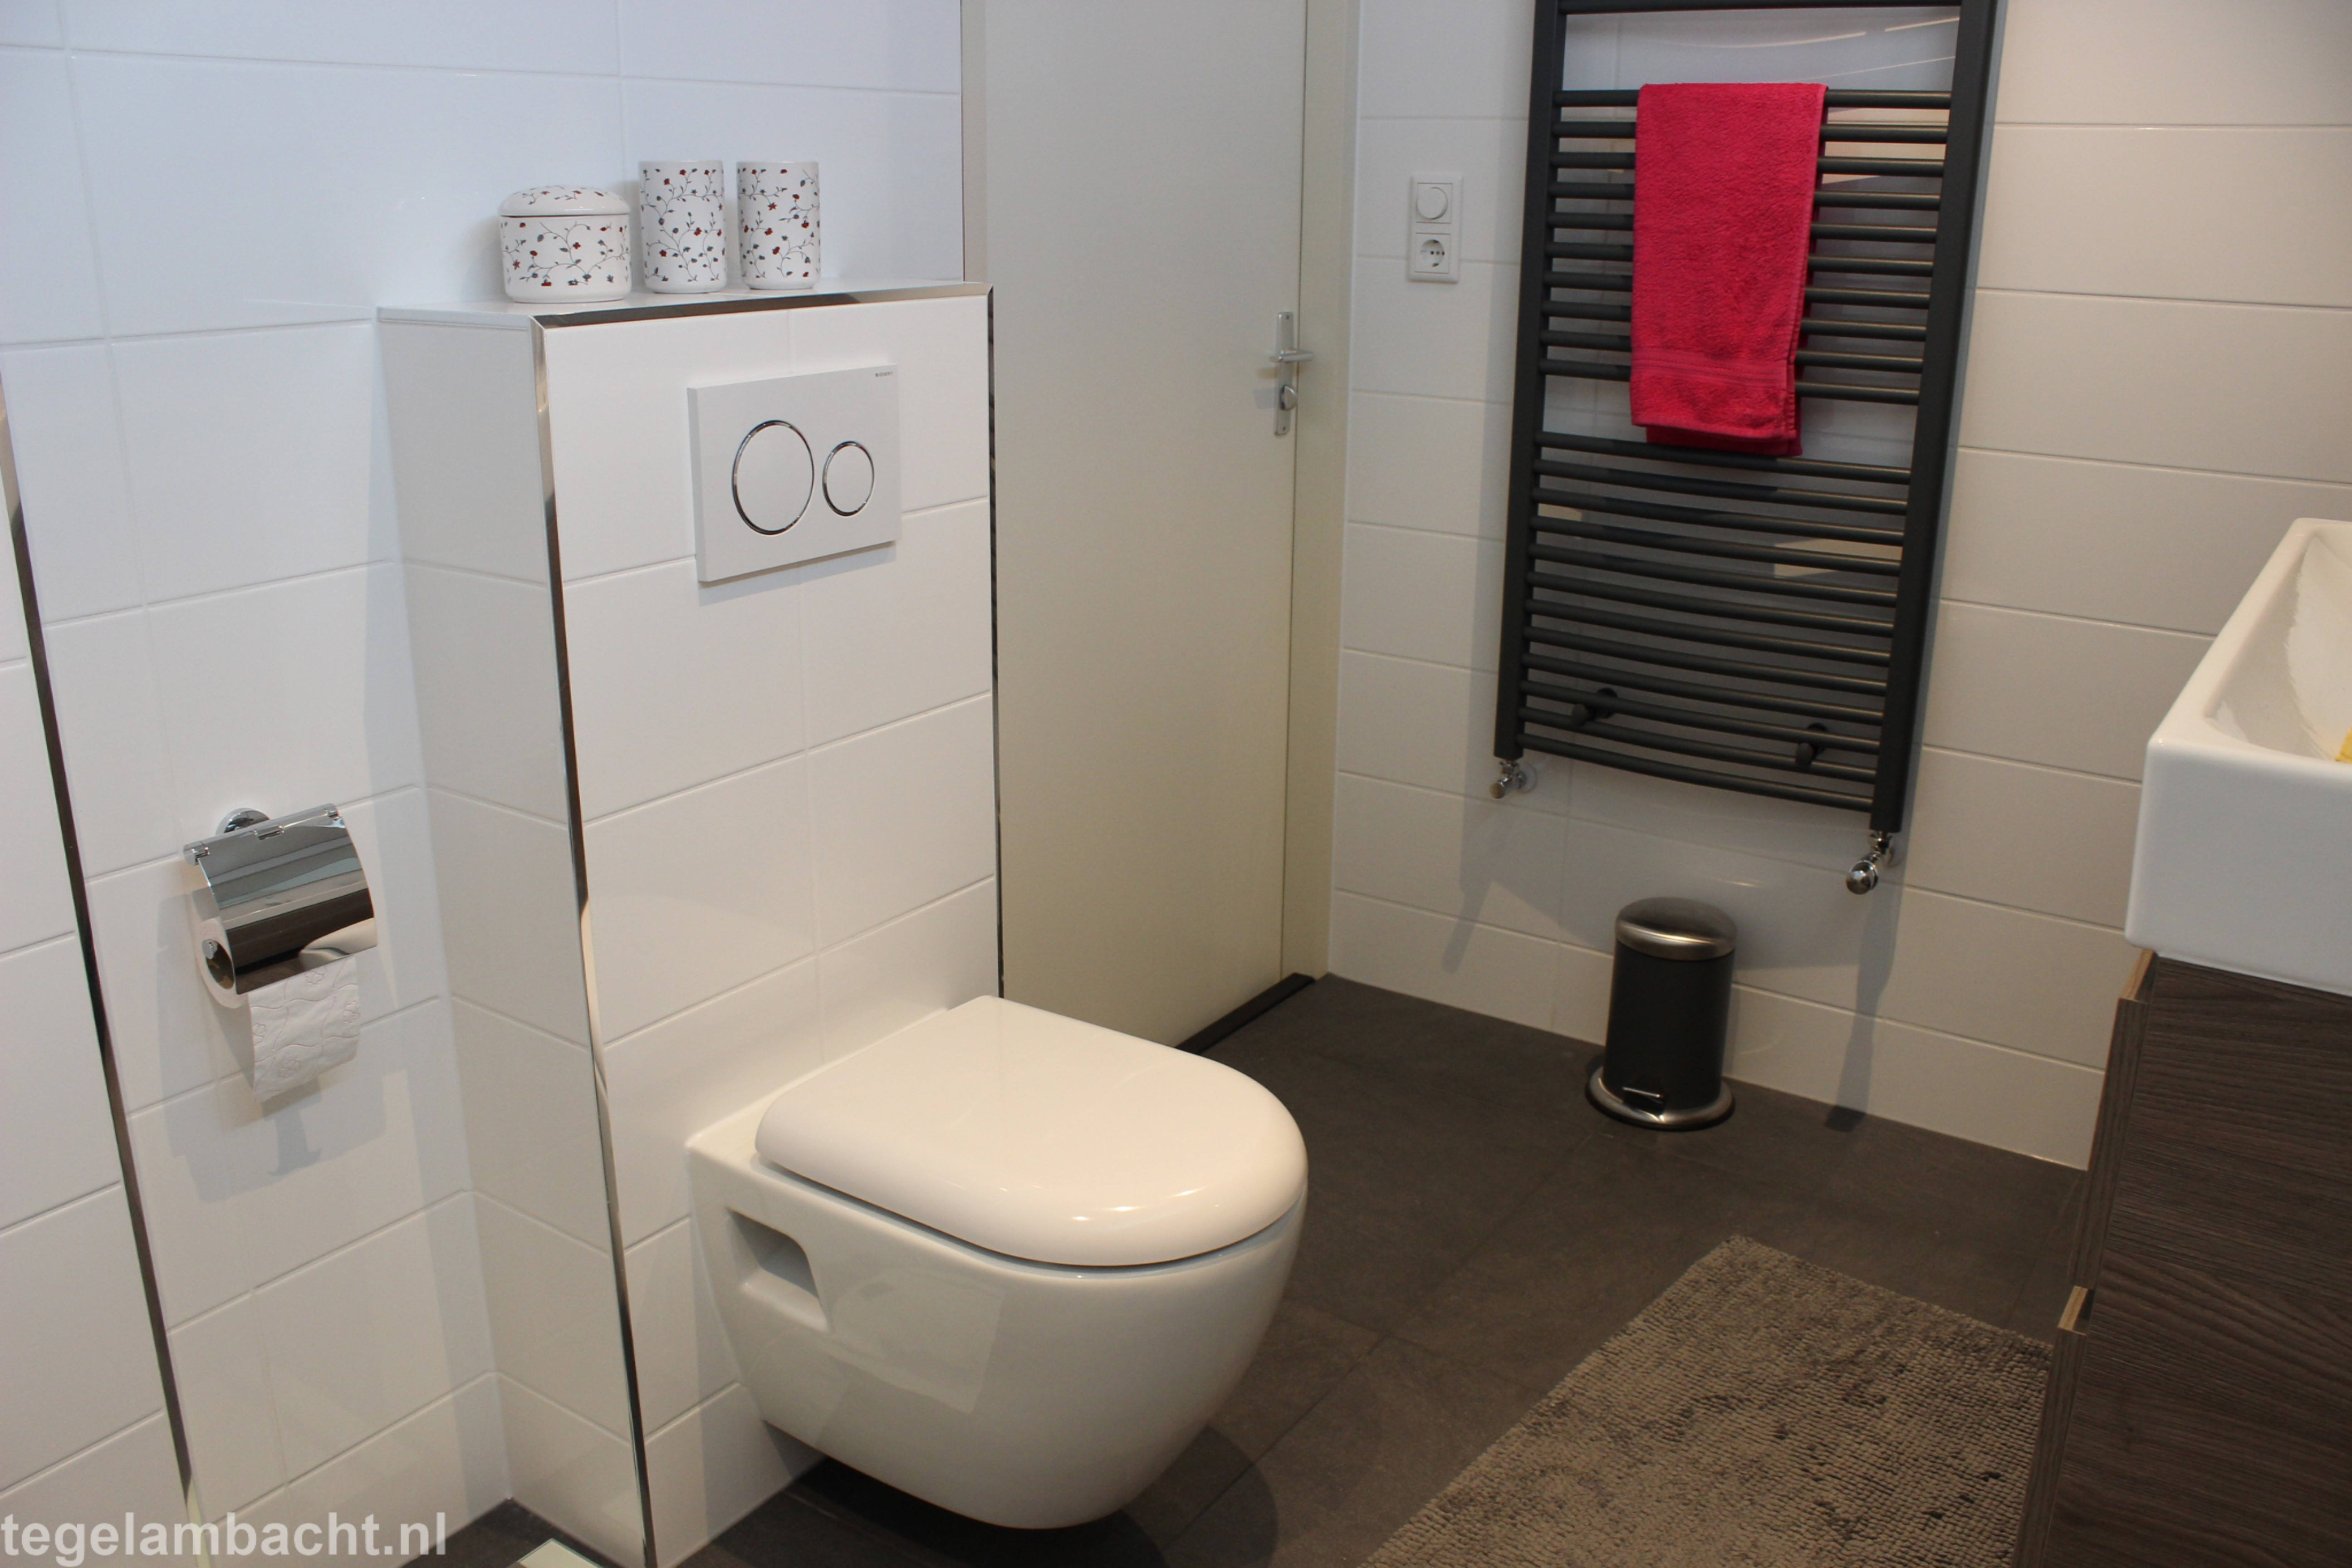 Uurtarief Badkamer Installateur : Badkamer almere project tegel ambacht